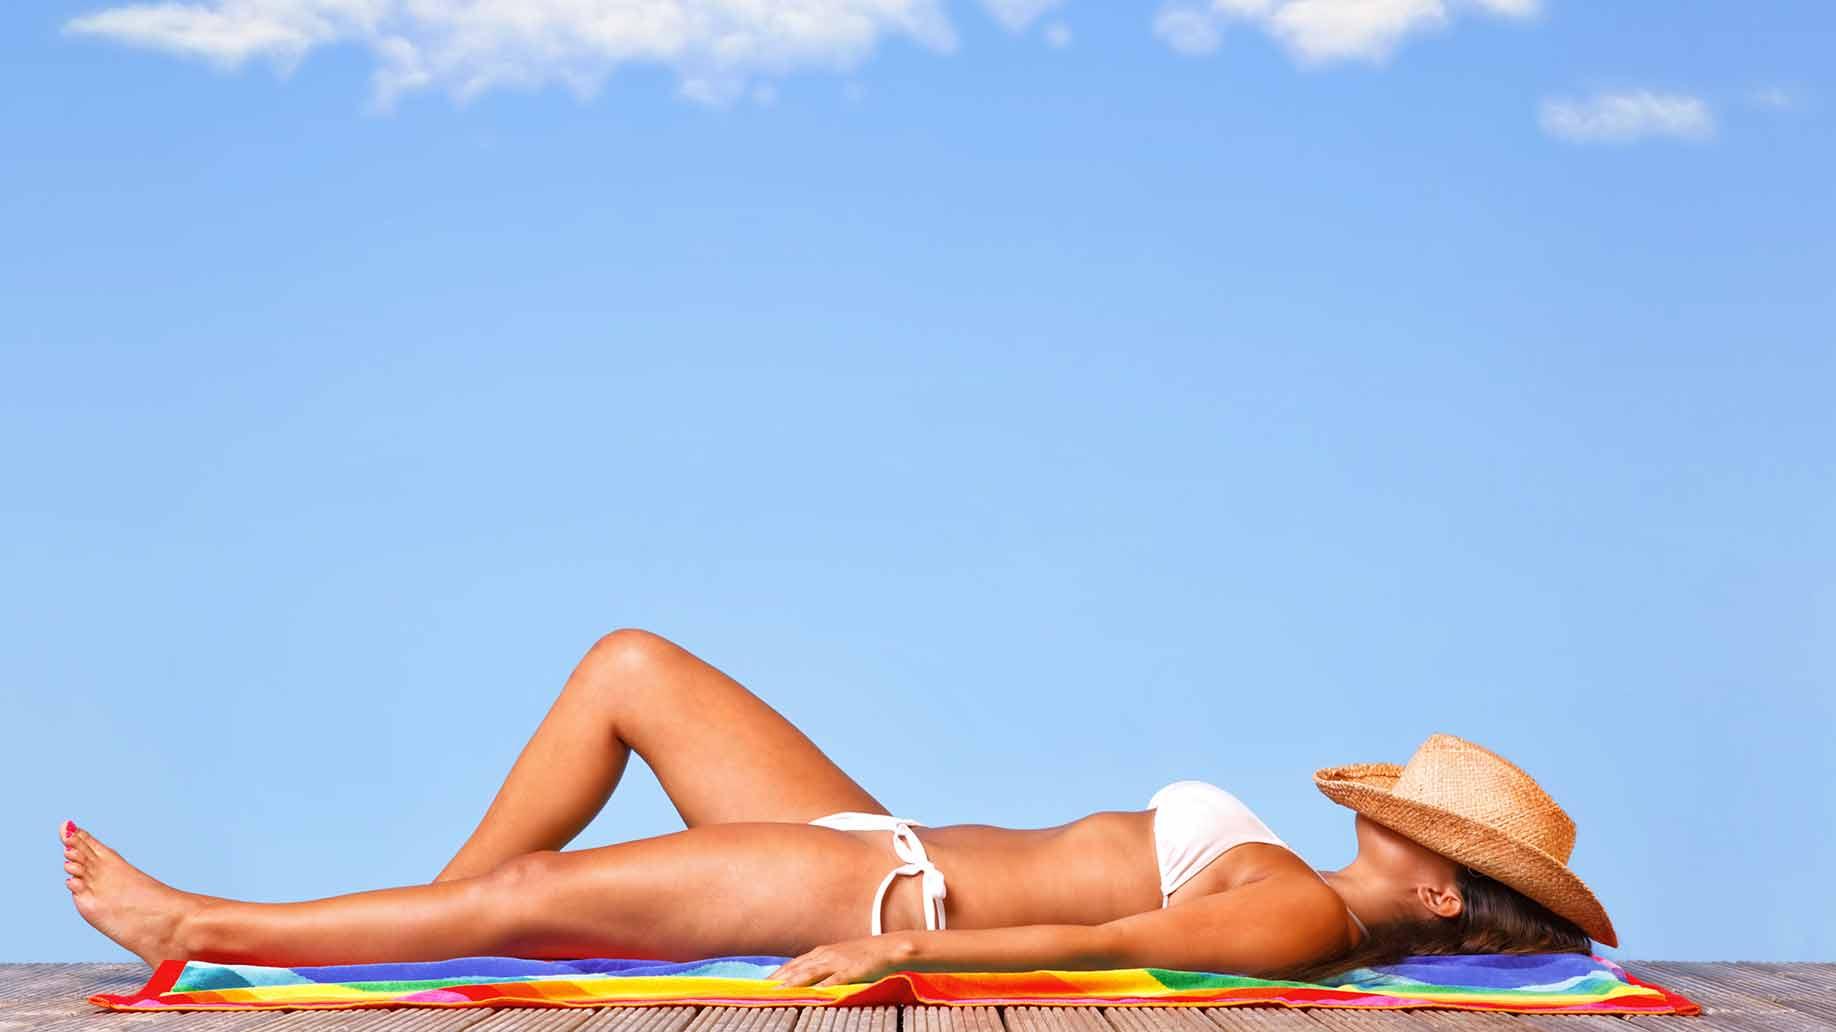 dark chocolate skin health sun protects against uv rays damage wrinkles